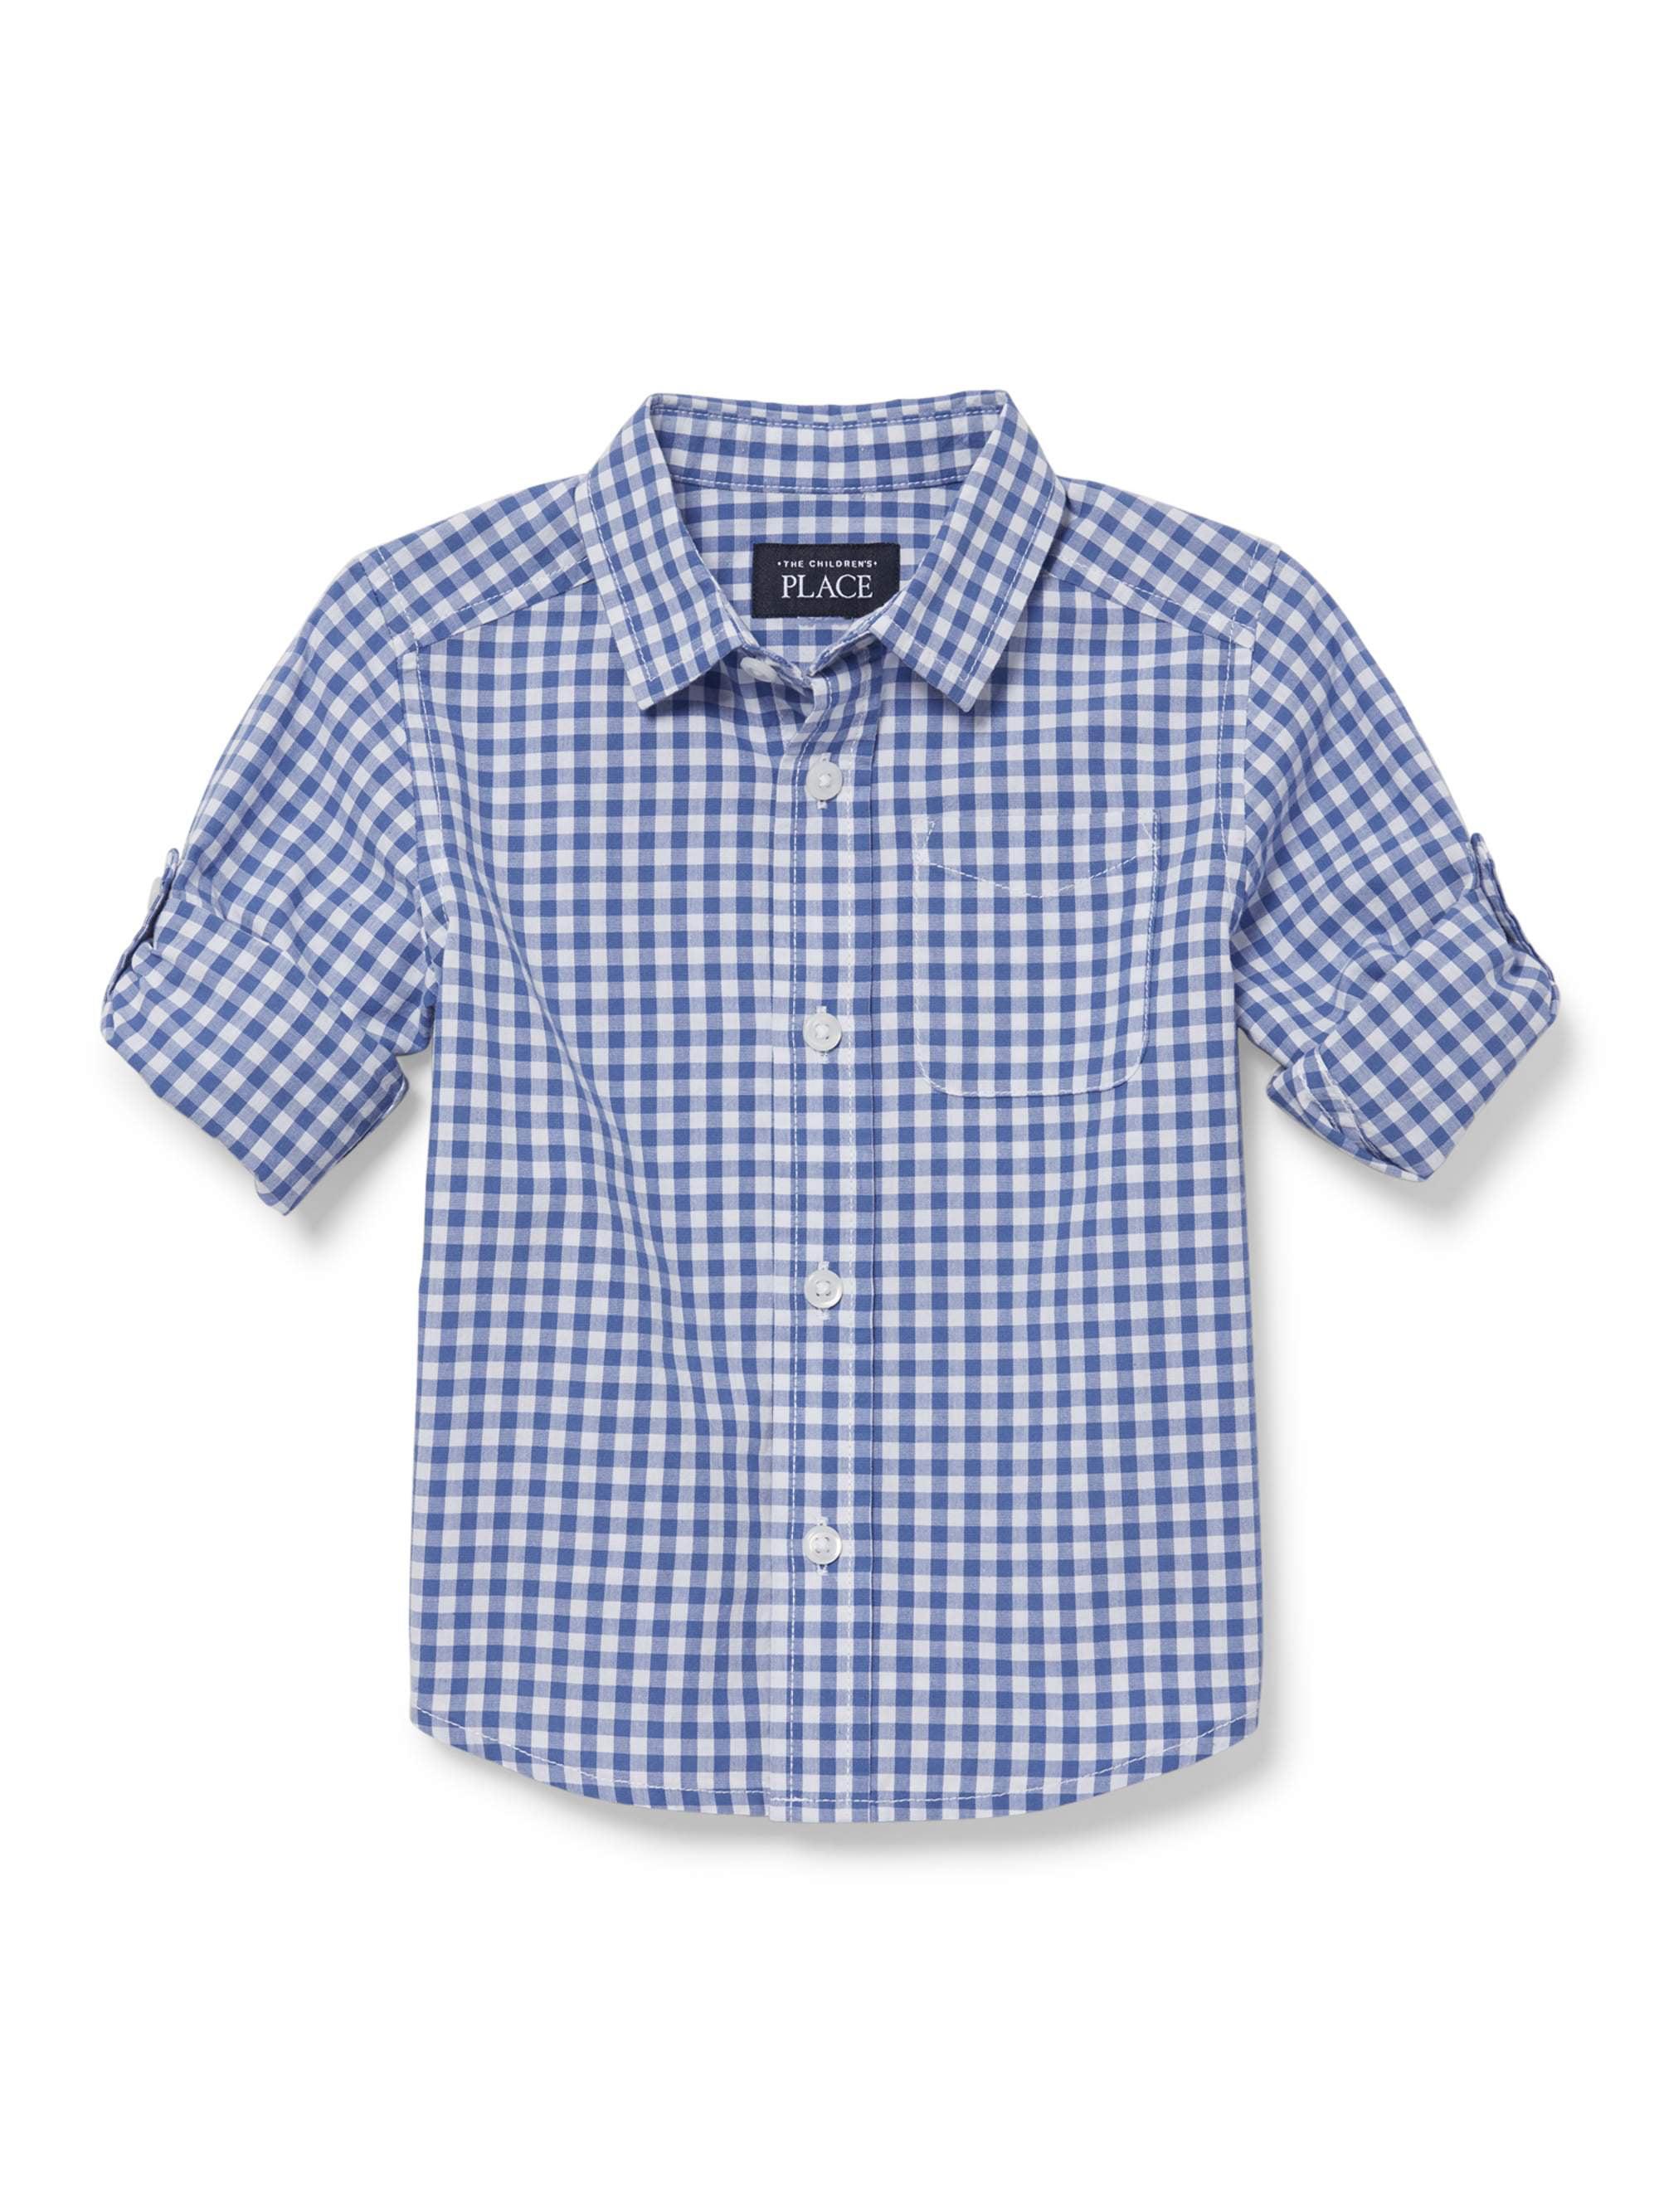 Long Sleeve Rollup Plaid Poplin Button Up Shirt (Baby Boys & Toddler Boys)